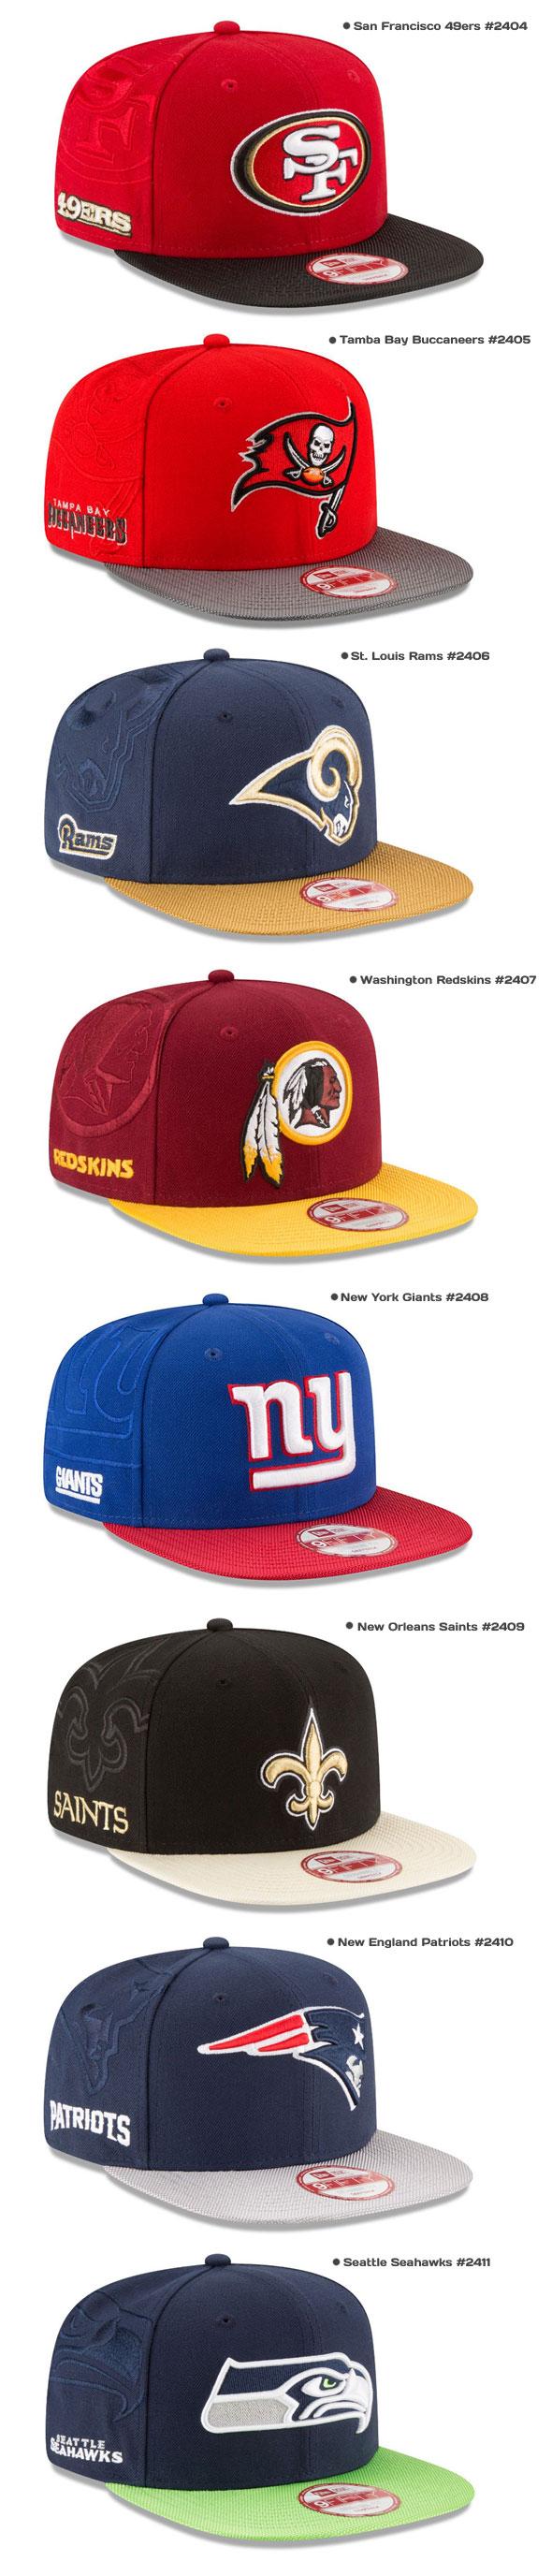 New Era Cap Snapback 9FIFTY NFL Sideline 16 17 Seahawks Patriots ... e198fffc4a2d